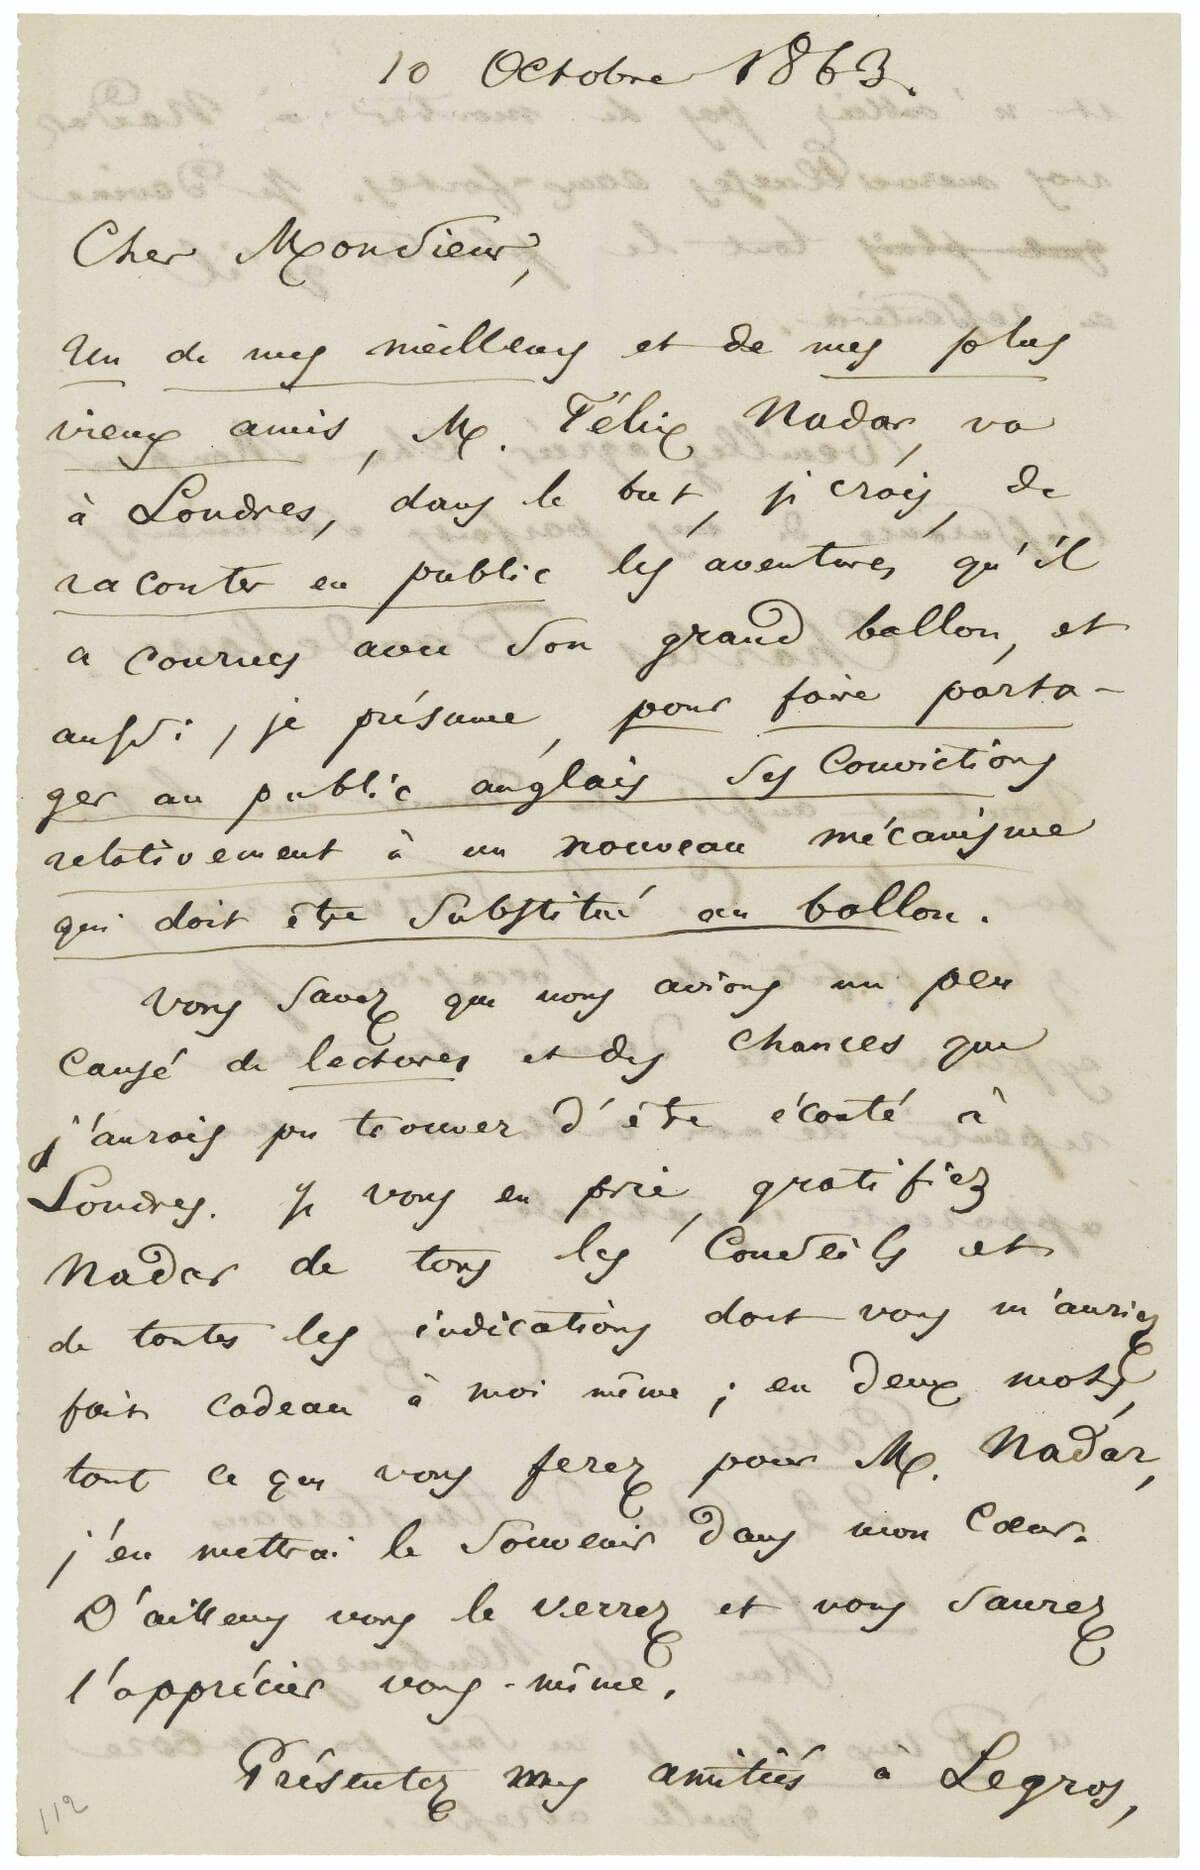 Charles Baudelaire aan James Abbott McNeill Whistler. Parijs, 10 oktober 1863.  Vertalingen Vivienne Stringa